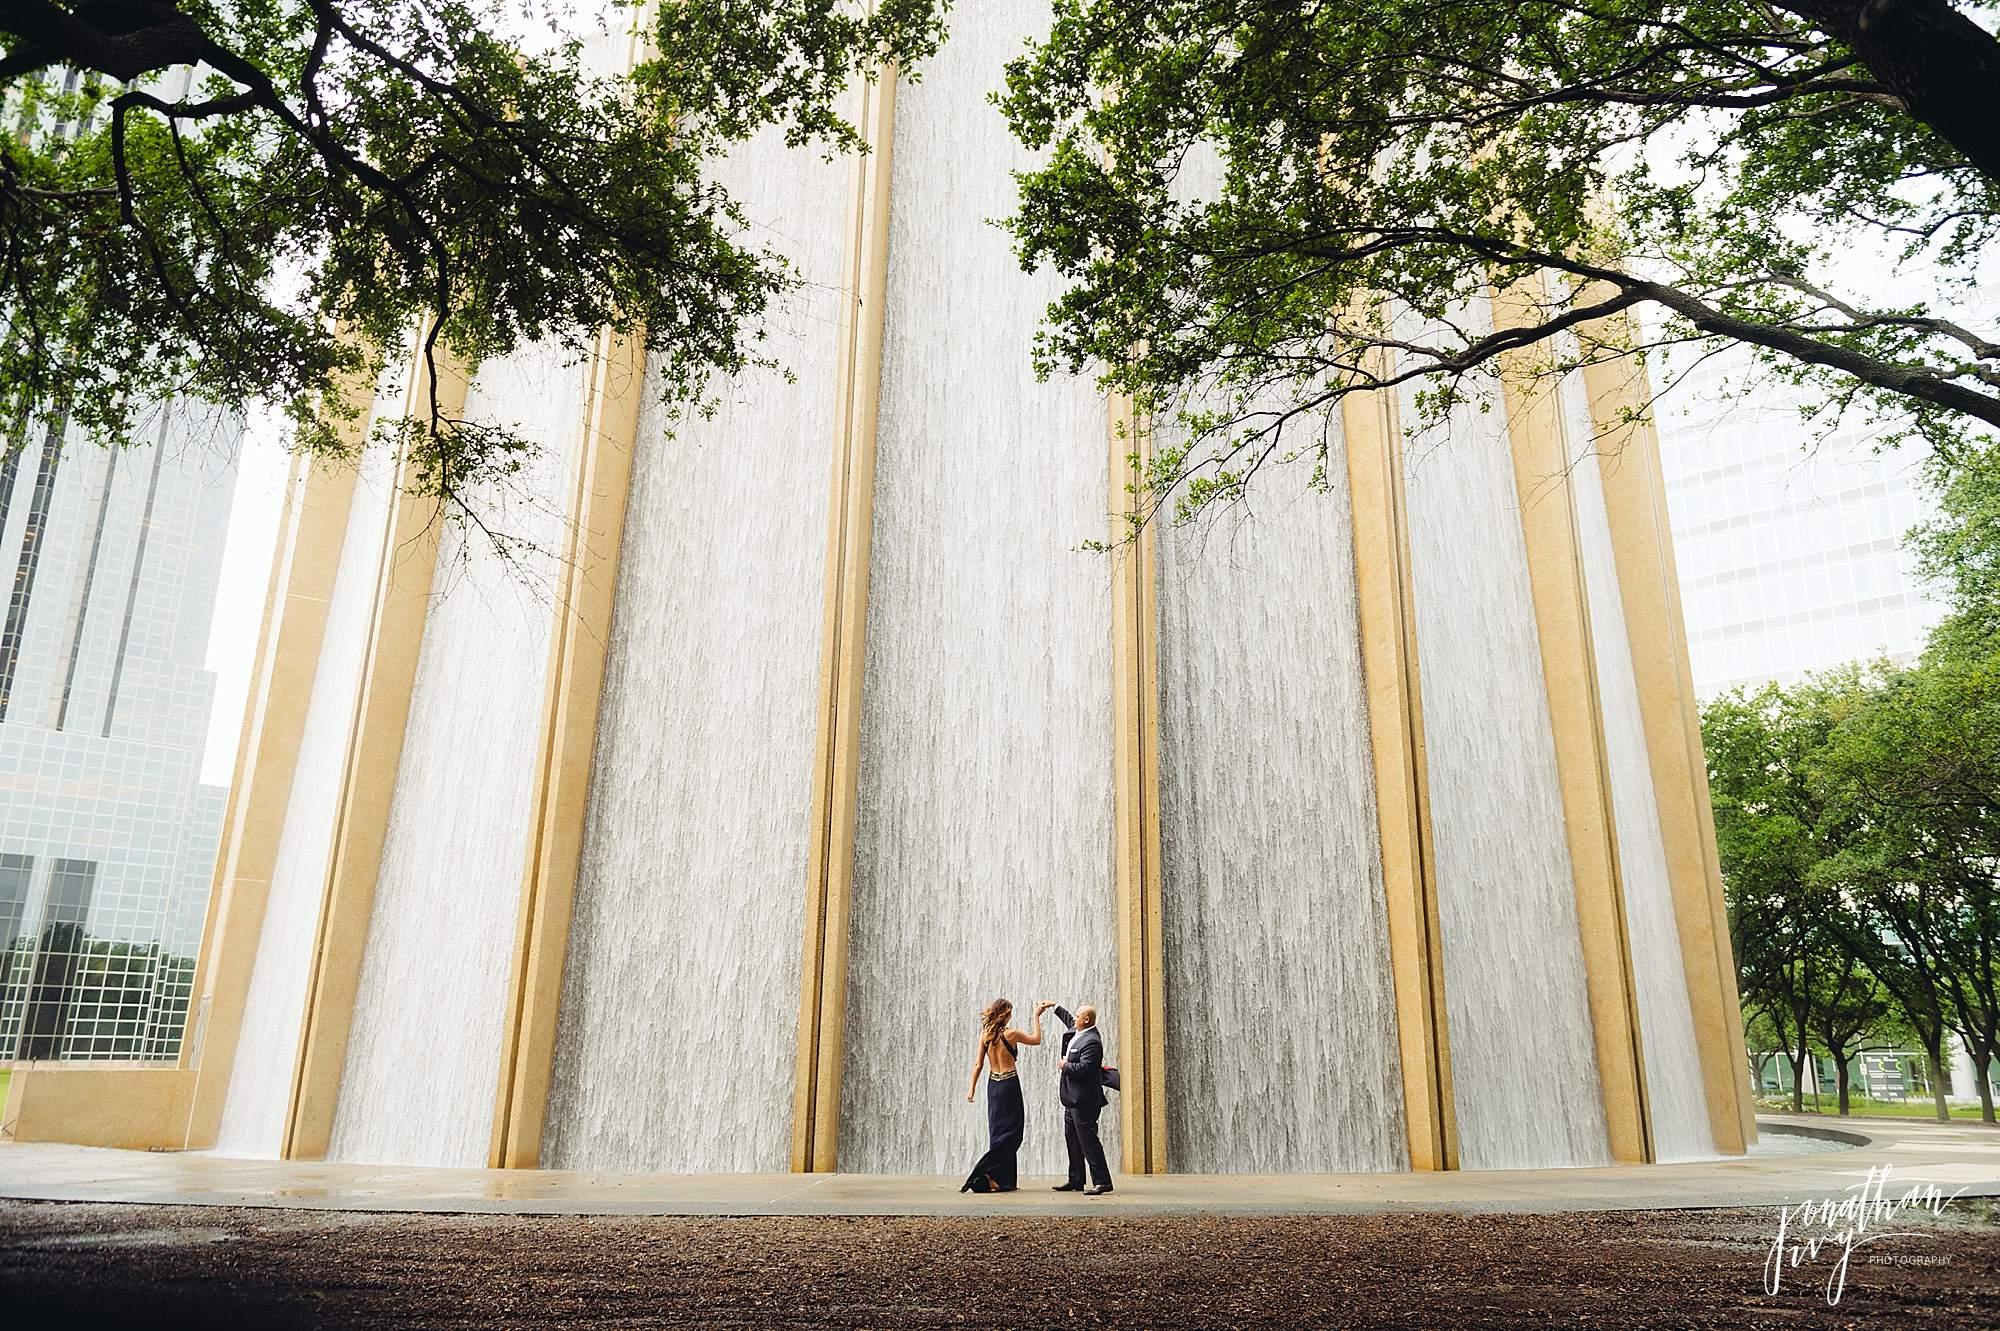 Romantic-Engagement-Photos-Houston_0004.jpg